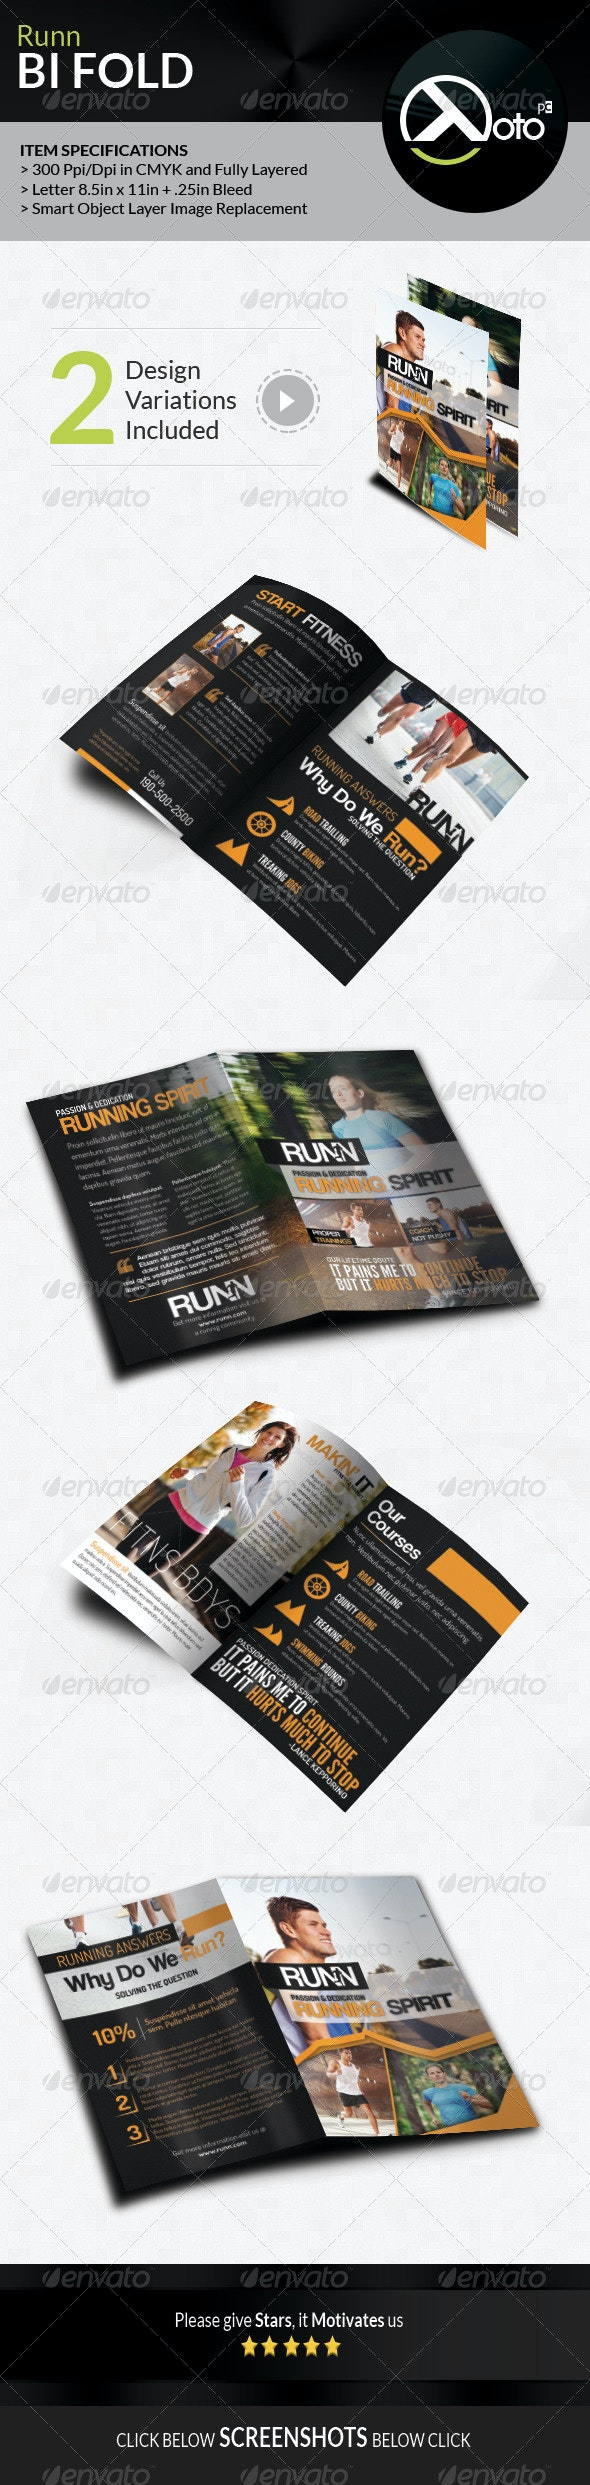 Runn Marathon Running Club Fitness Bifold Brochure - Brochures Print Templates